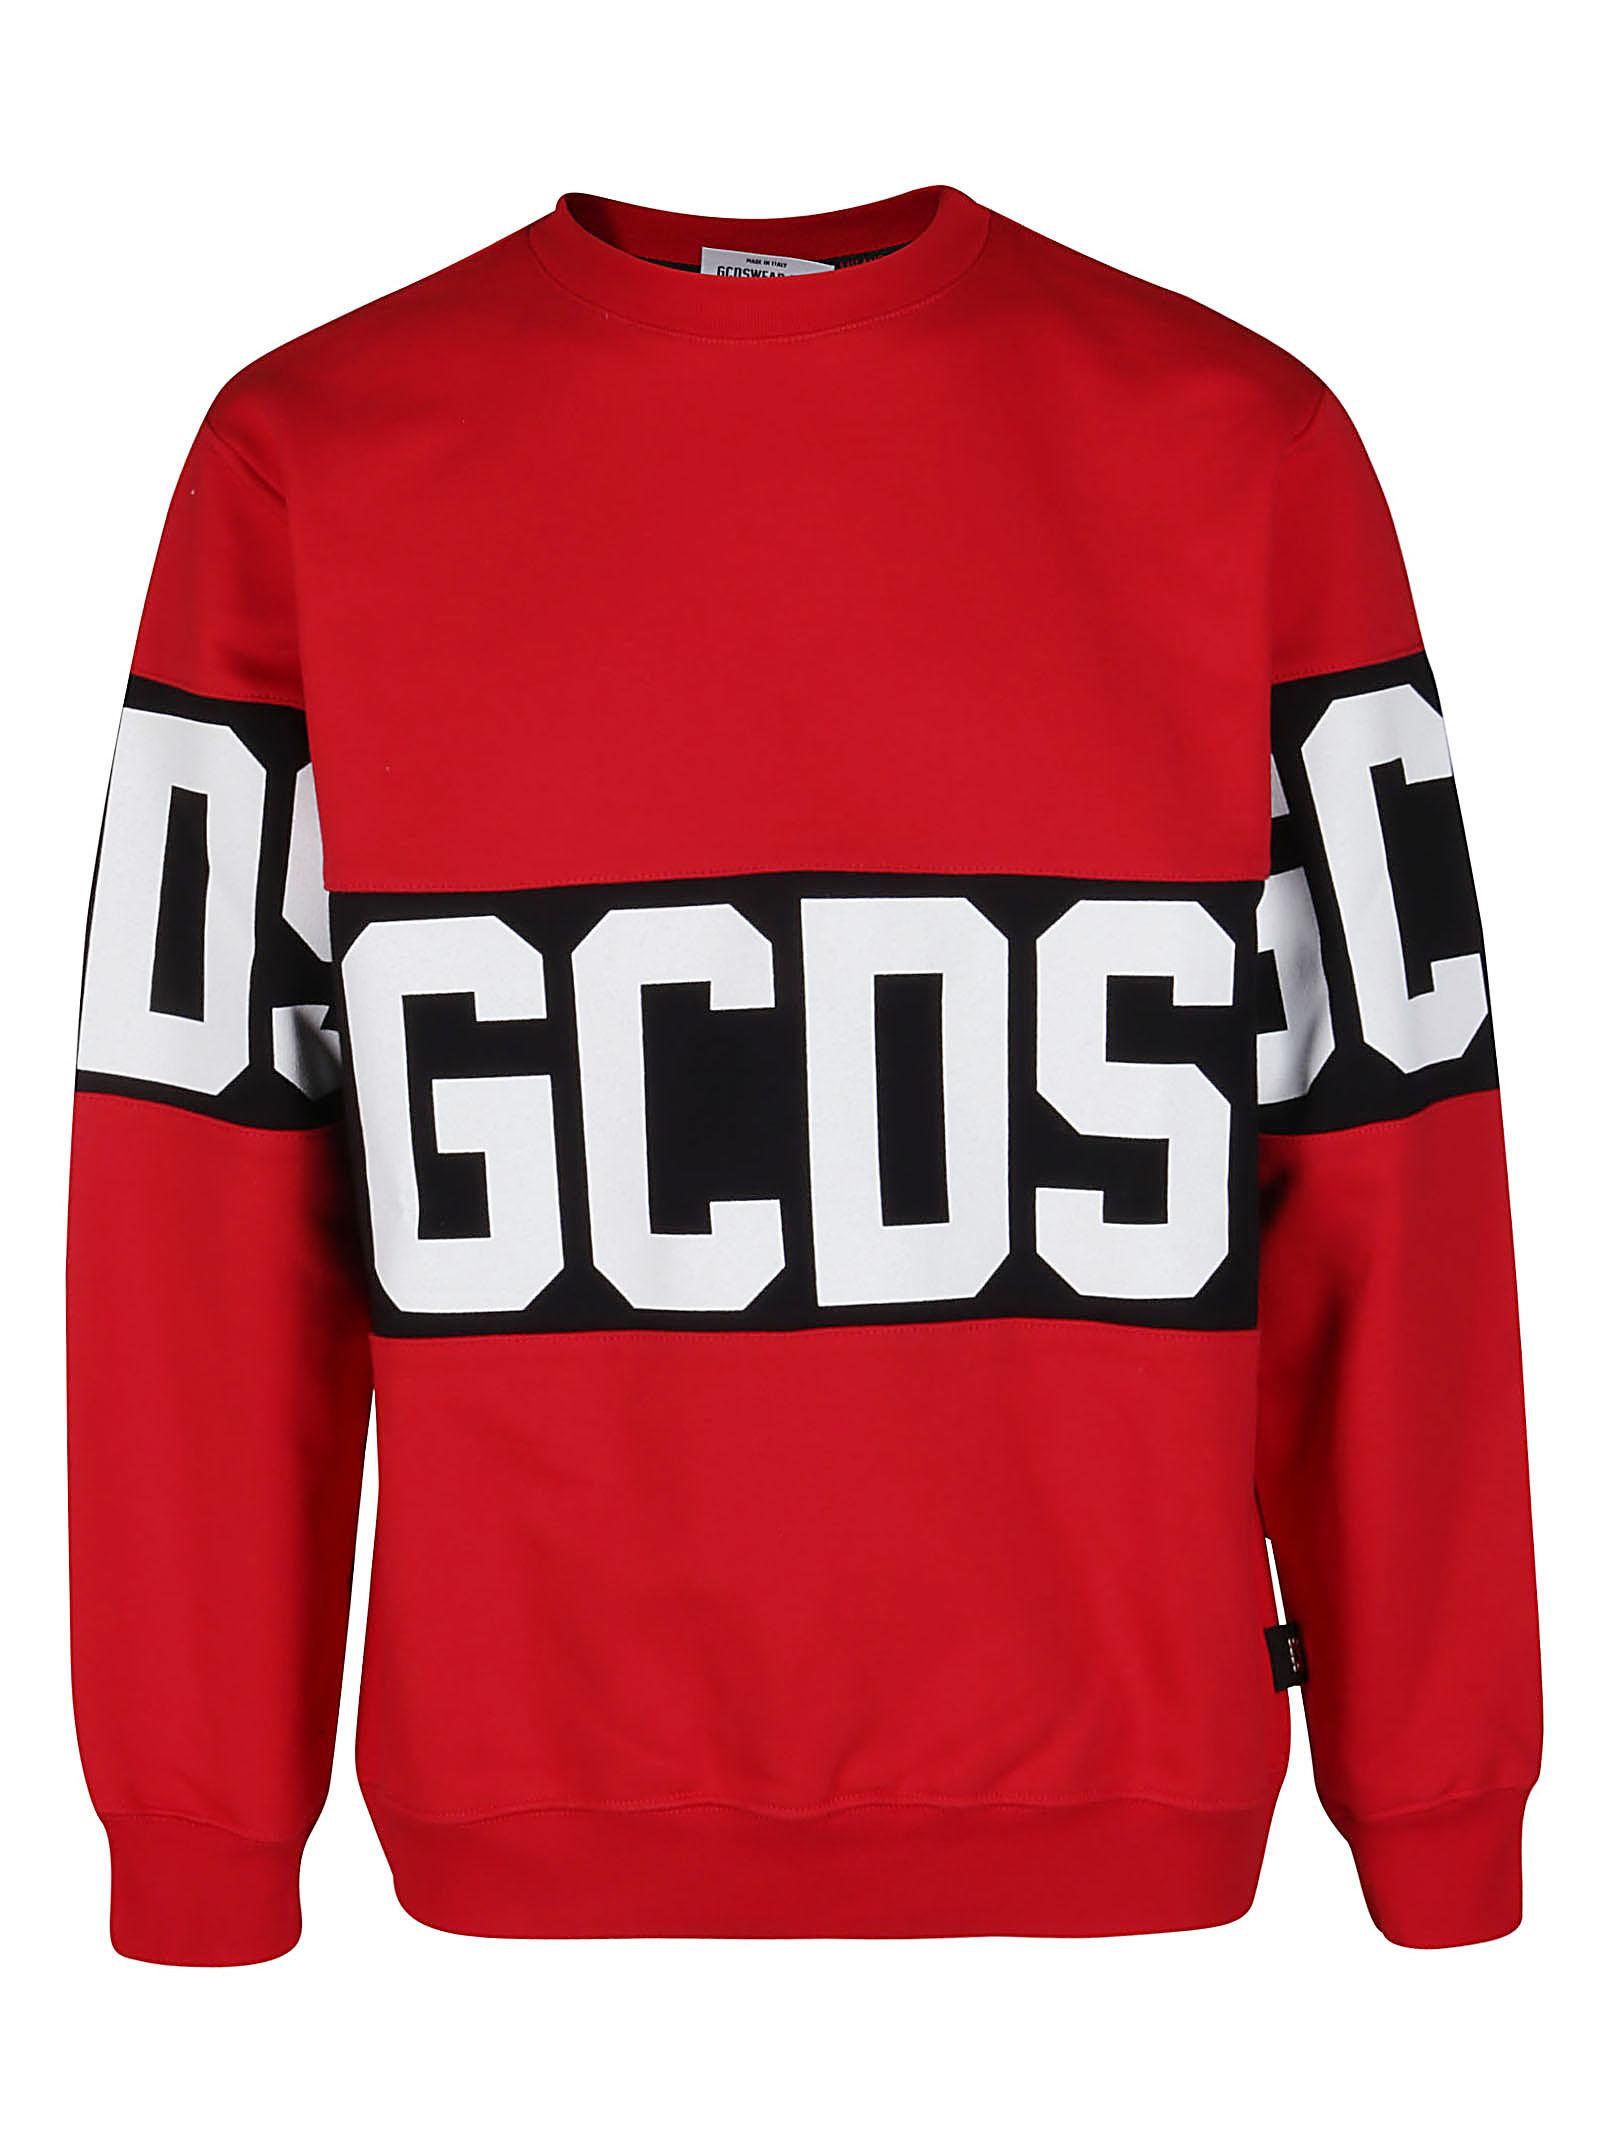 Best Price Gcds Red Cotton Sweatshirt - Top Quality